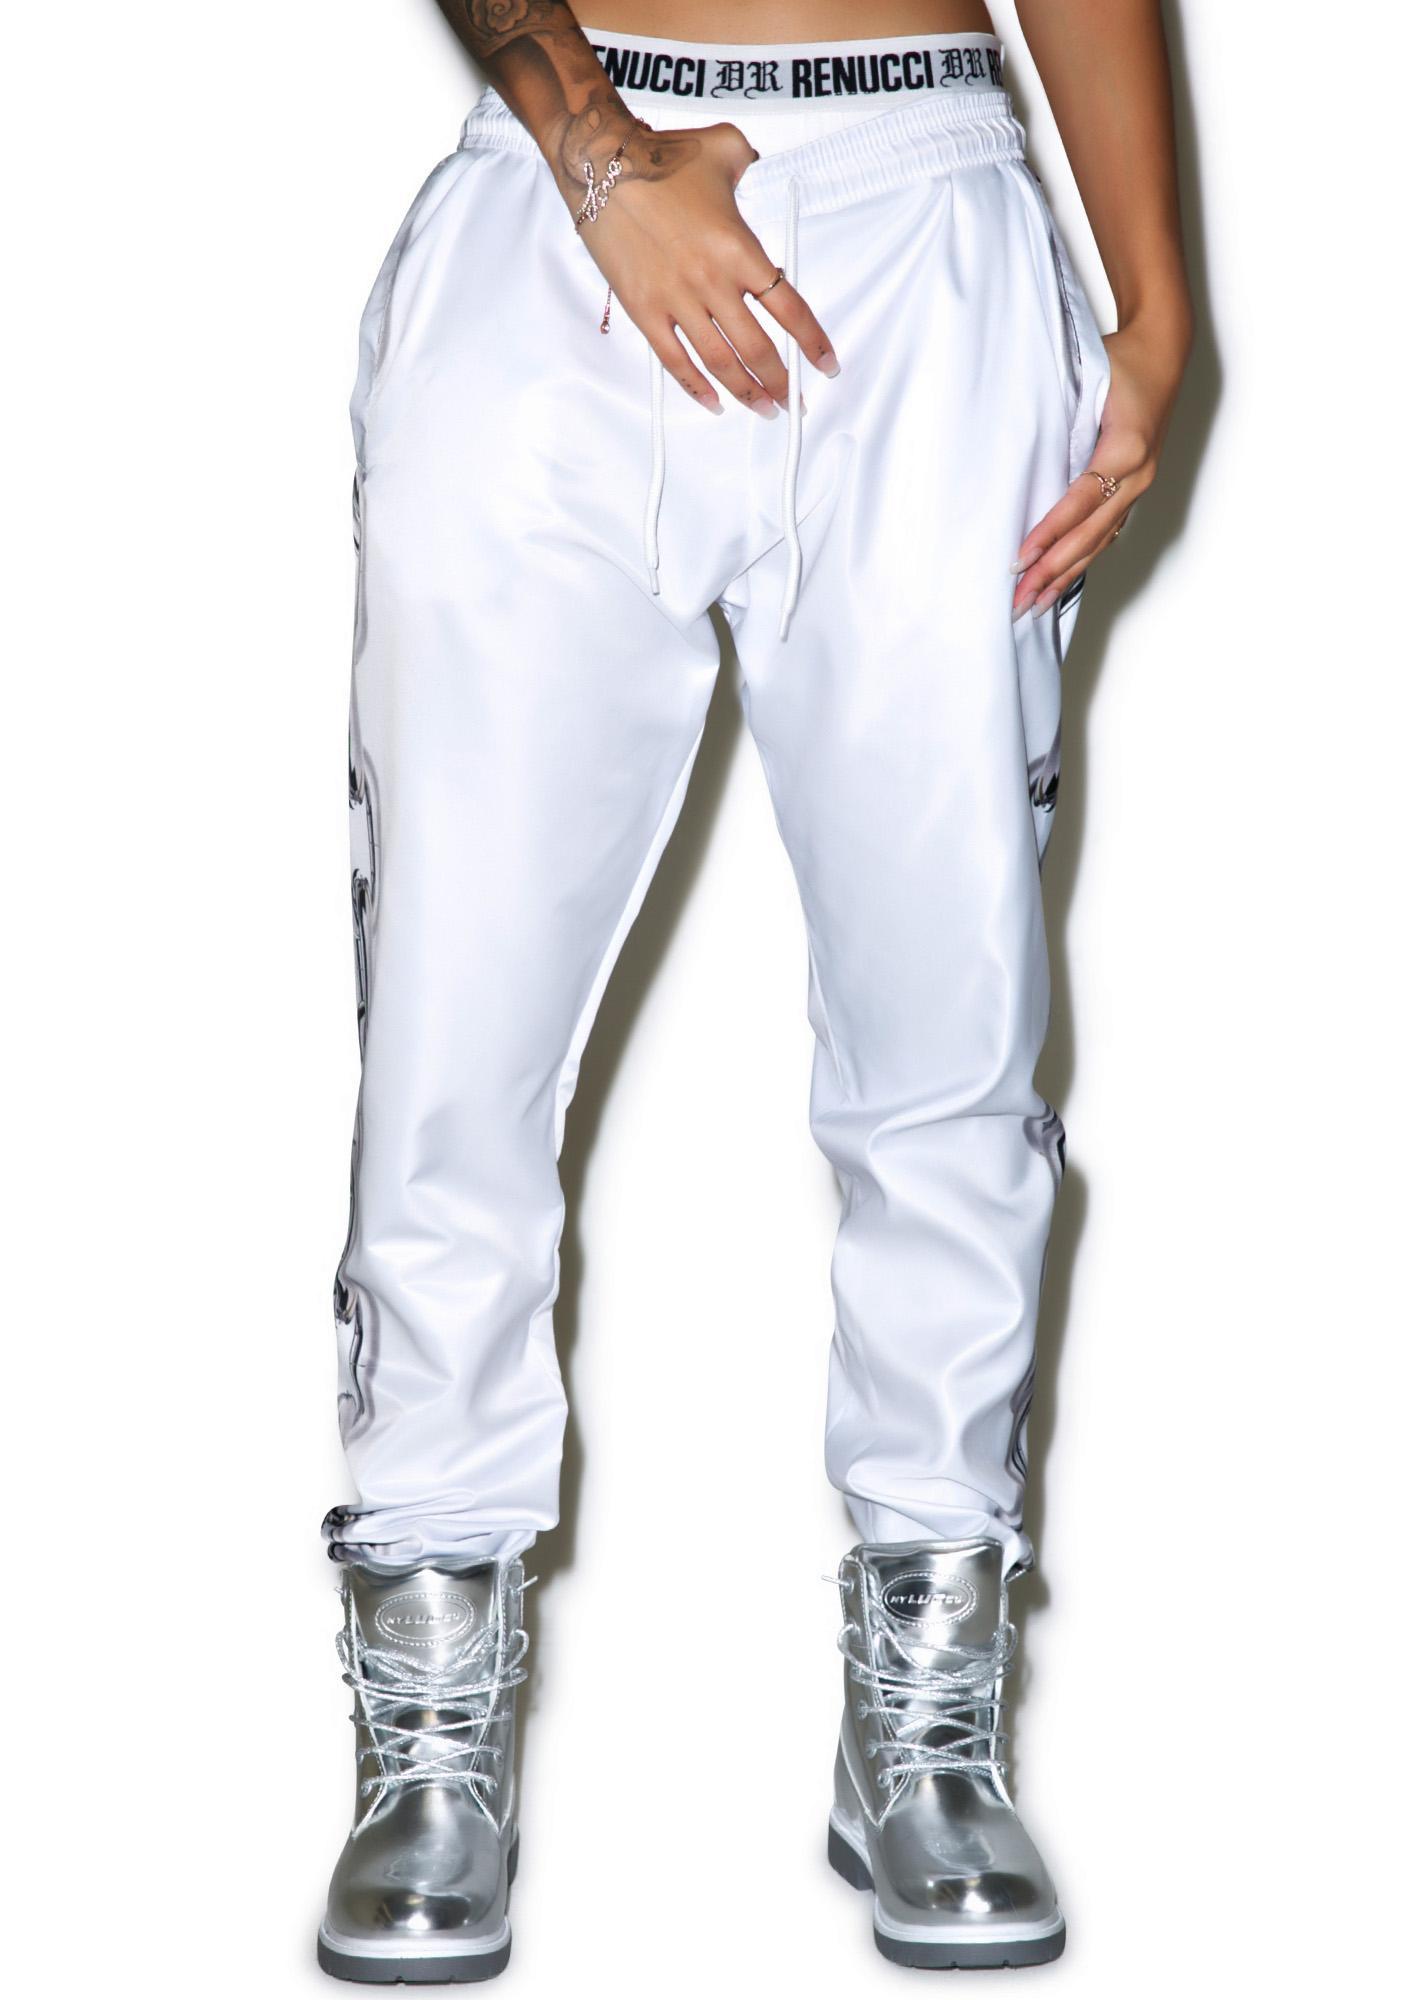 SOWET Locked Up Pants